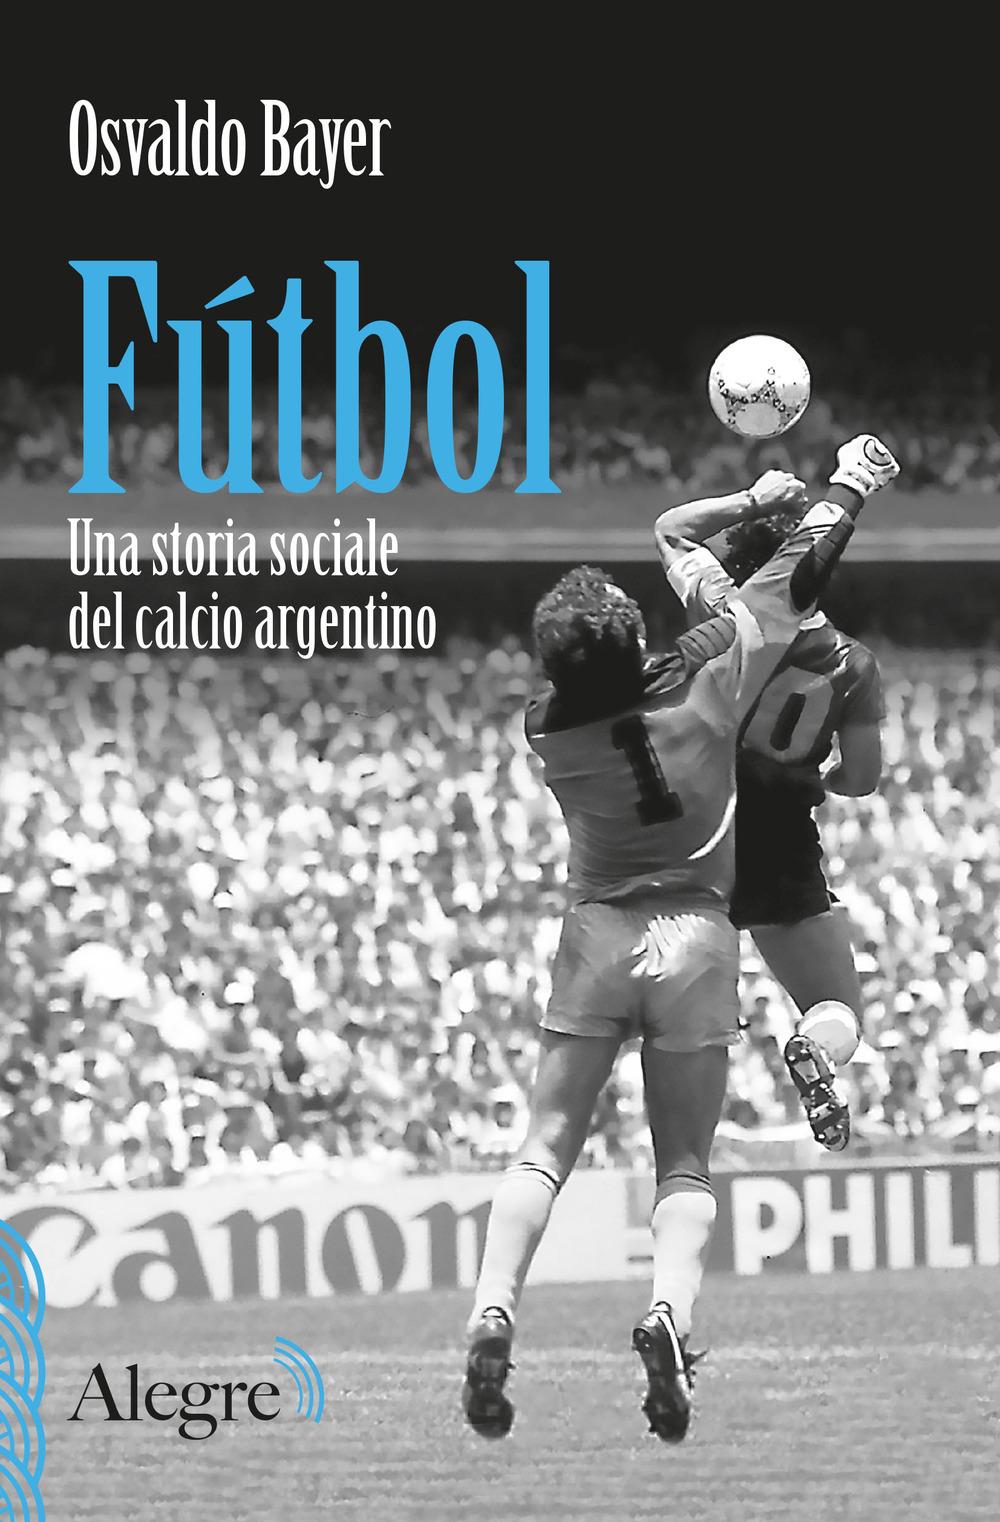 FÚTBOL. UNA STORIA SOCIALE DEL CALCIO ARGENTINO - Bayer Osvaldo - 9788898841899